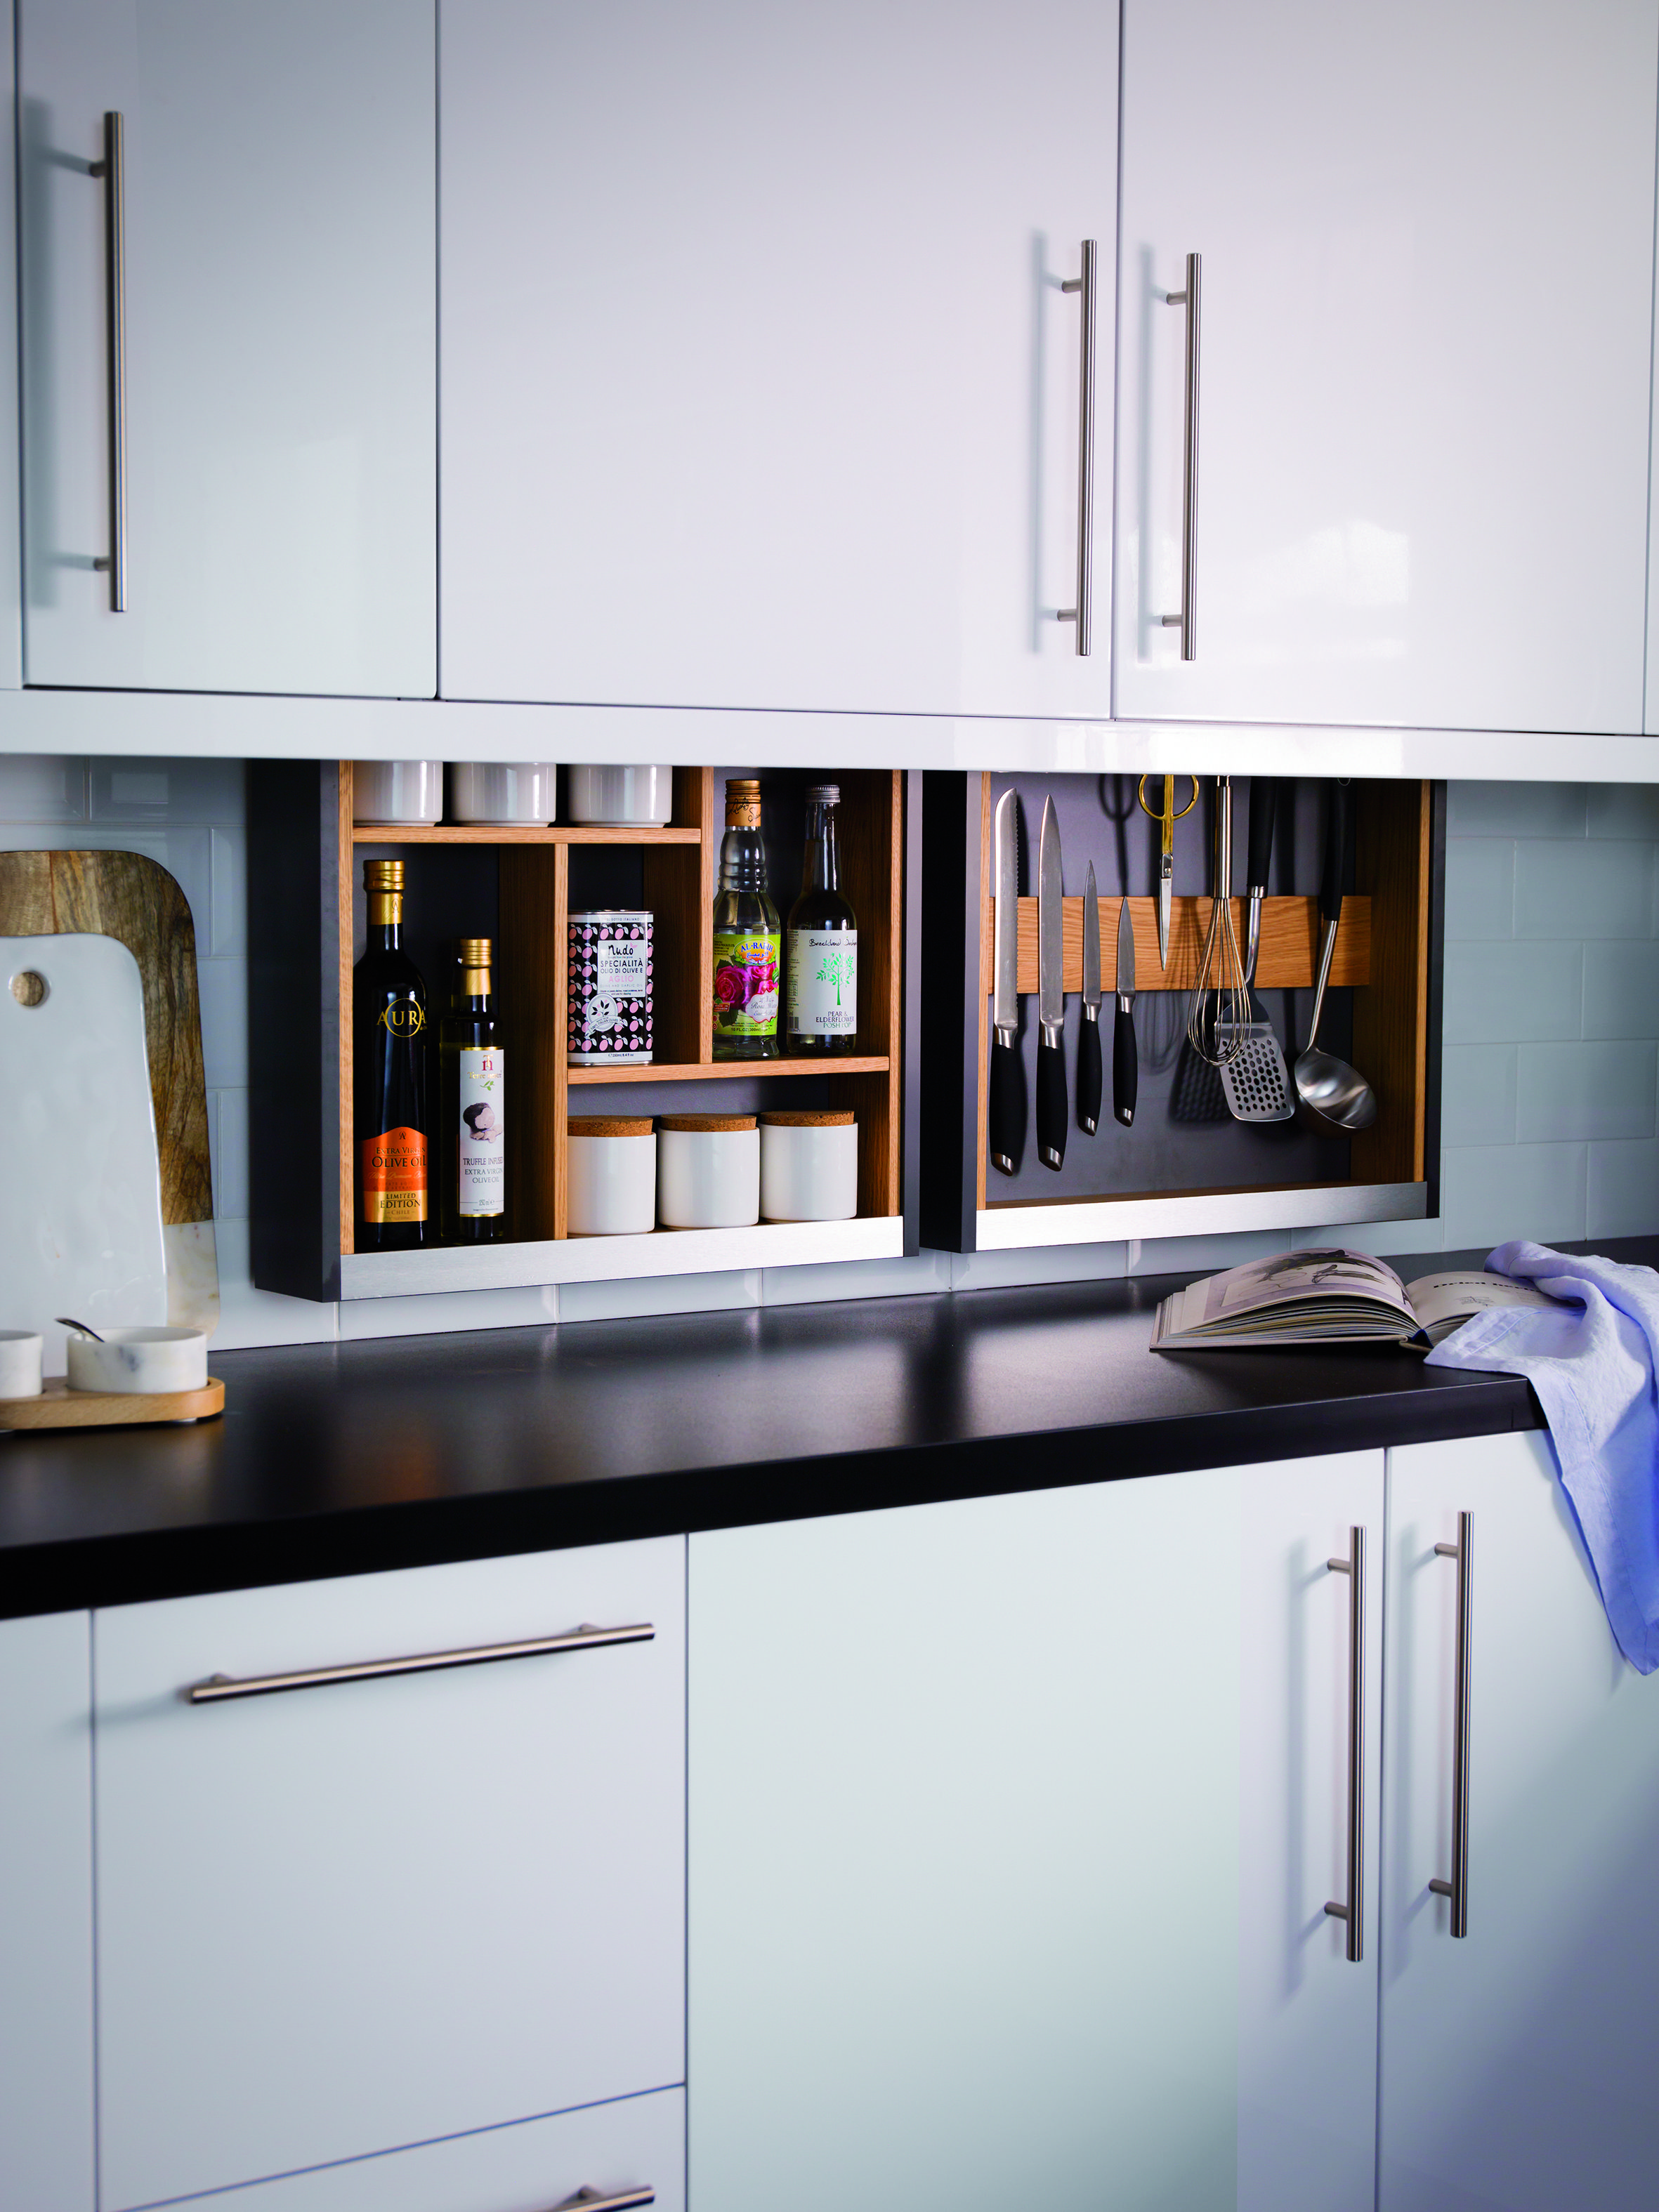 Innovative Kitchen Appliances Kitchen Innovations New From Magnet Appliances Kitchen